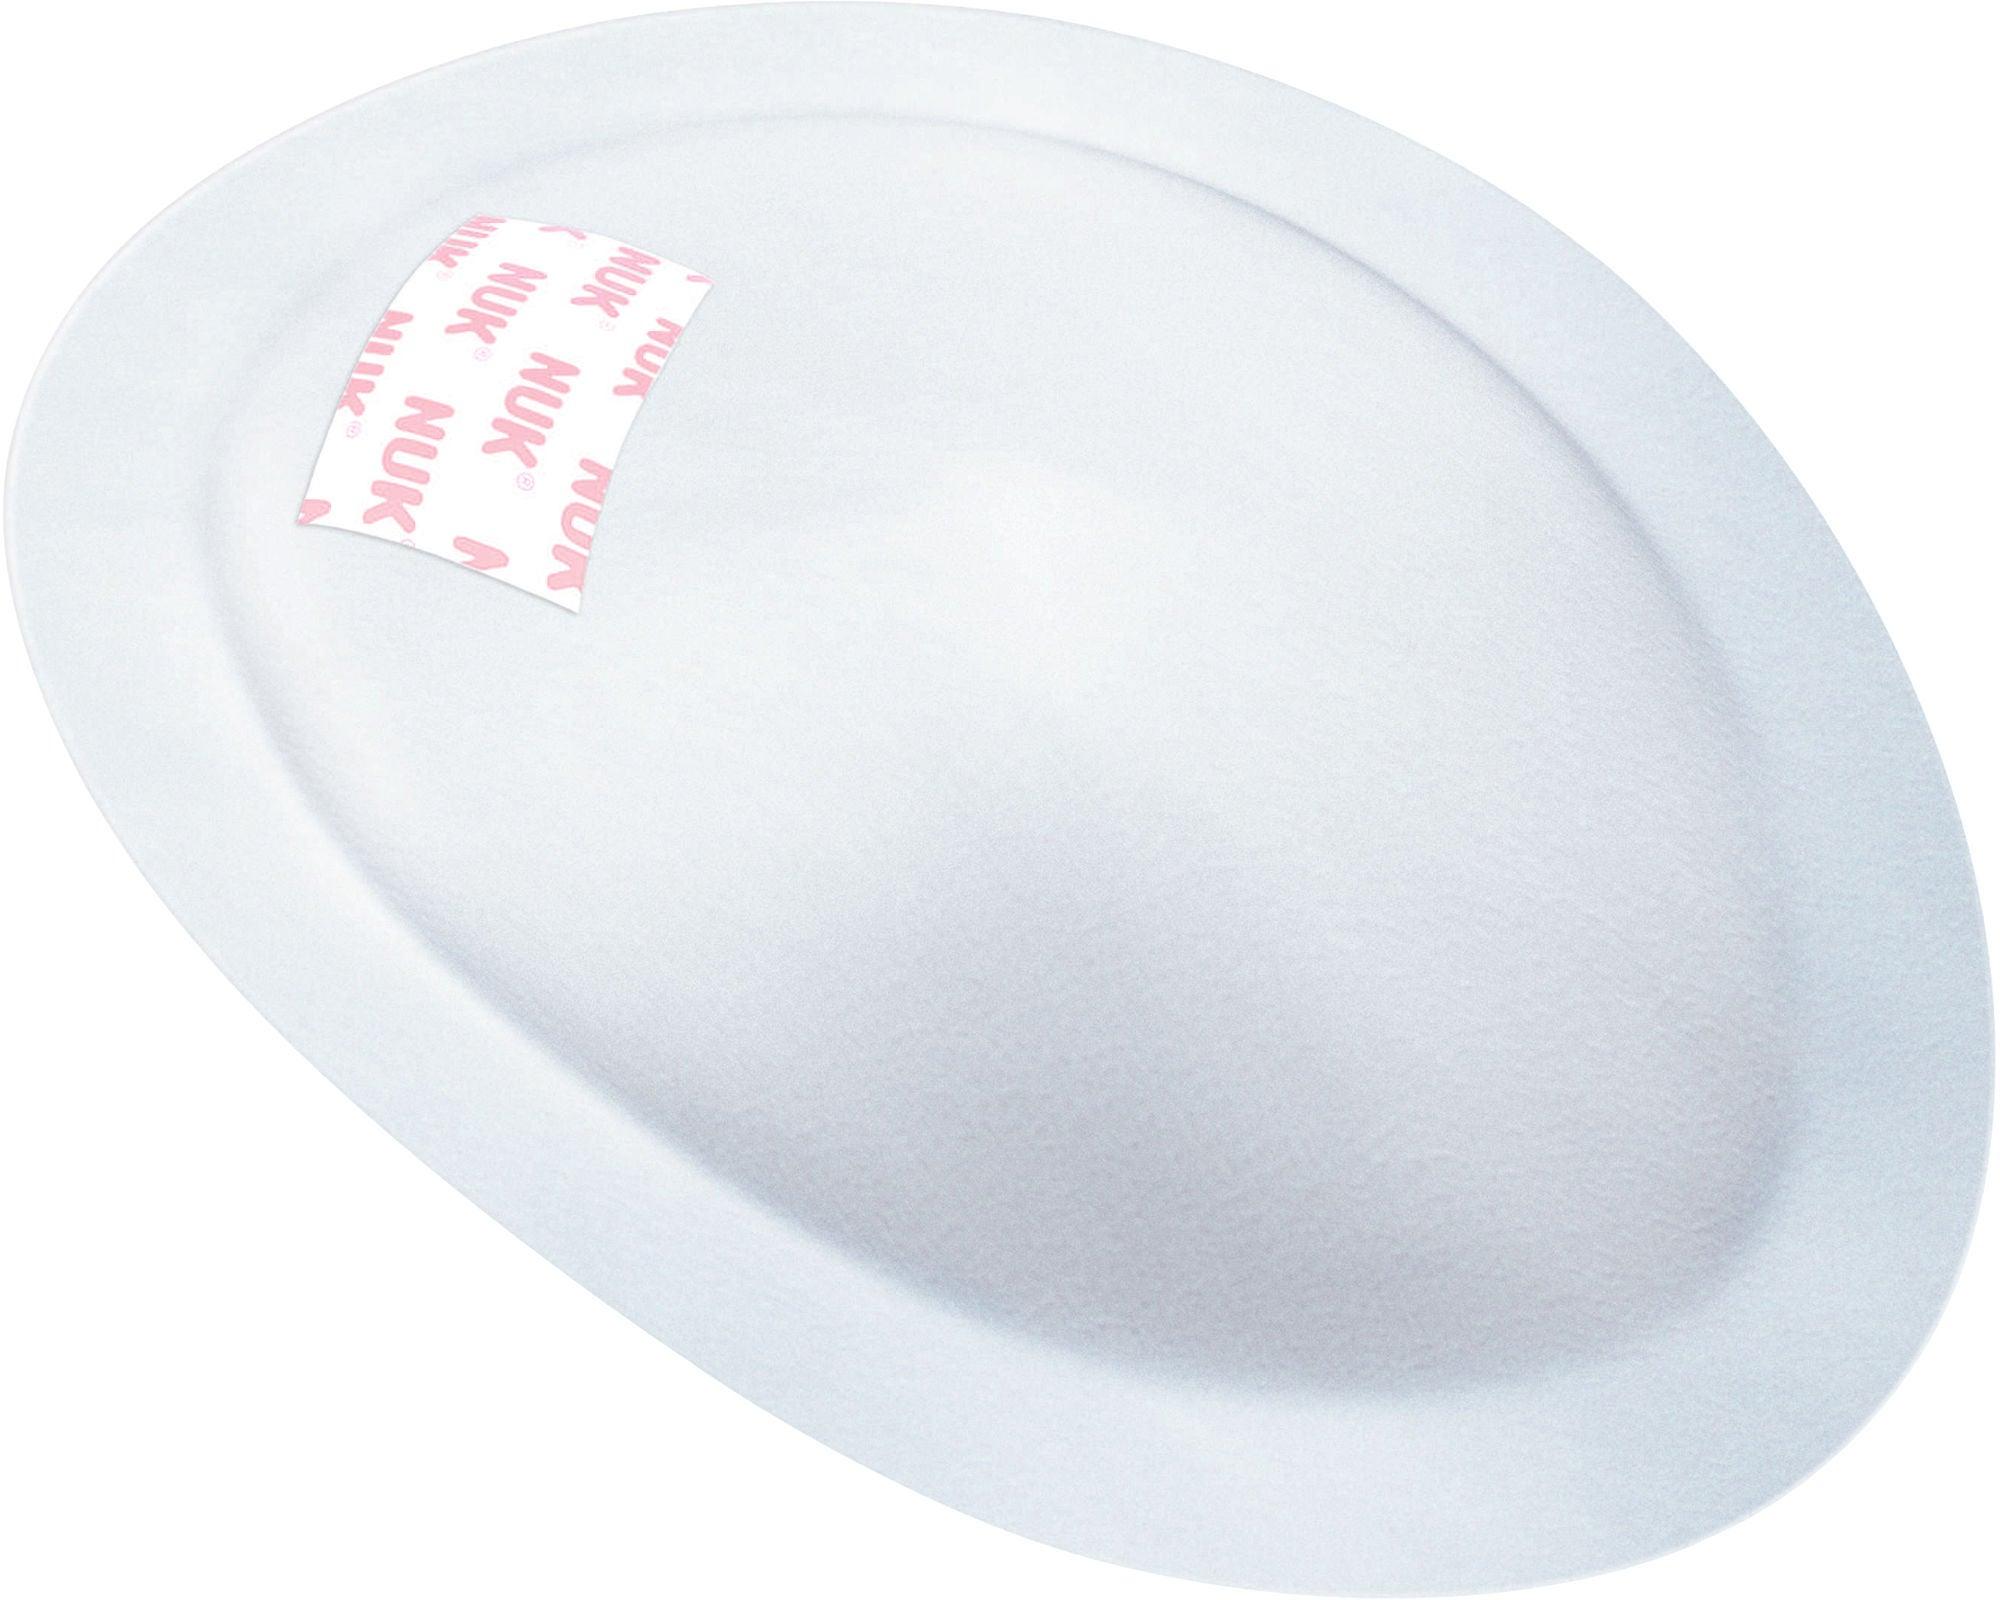 NUK Ultra Dry Amningsinlägg 12-pack